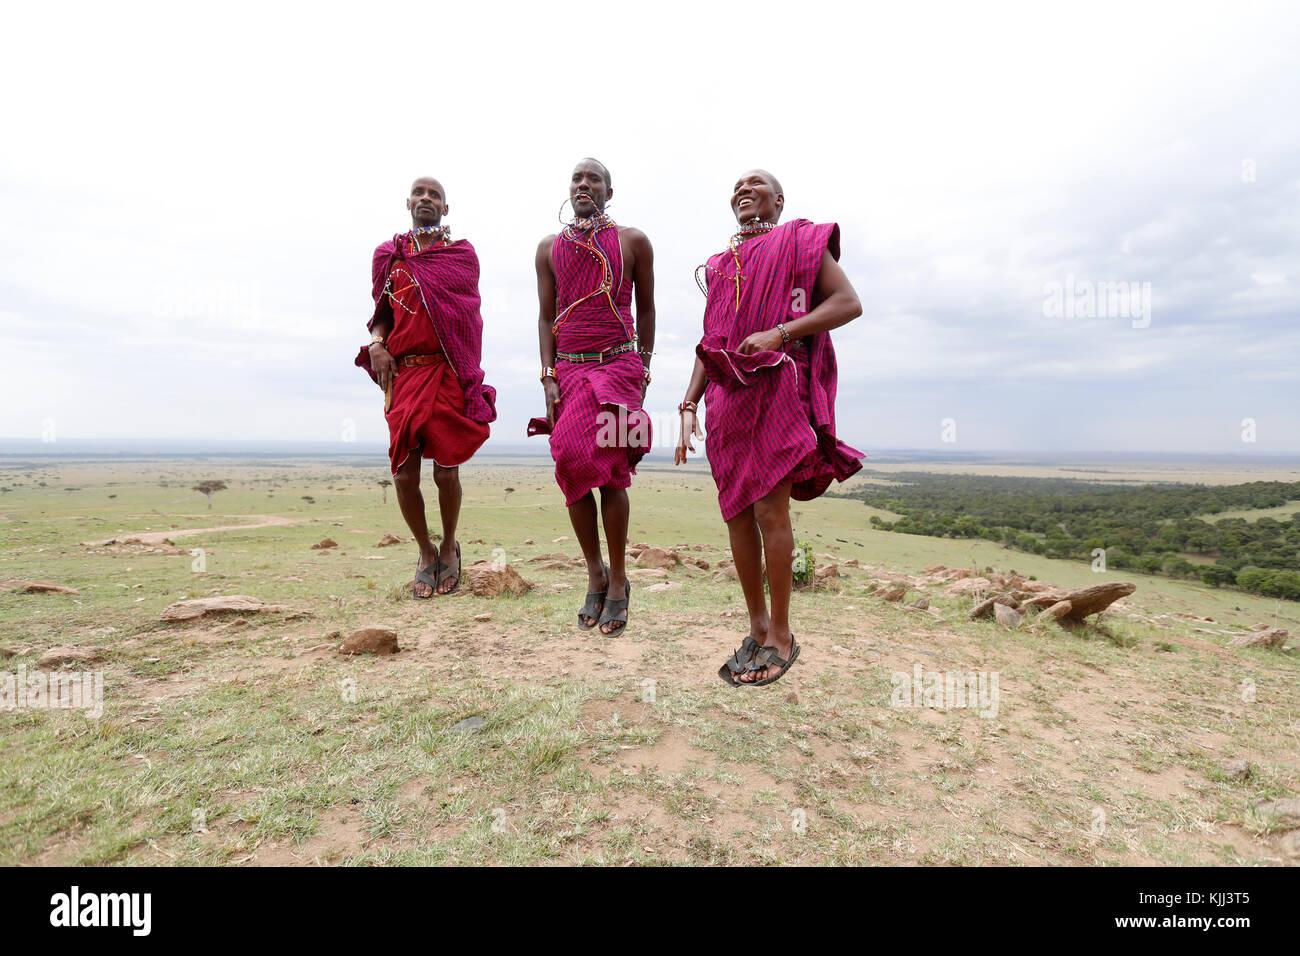 Masai warriors doing the traditional jump dance.  Masai Mara game reserve. Kenya. Stock Photo